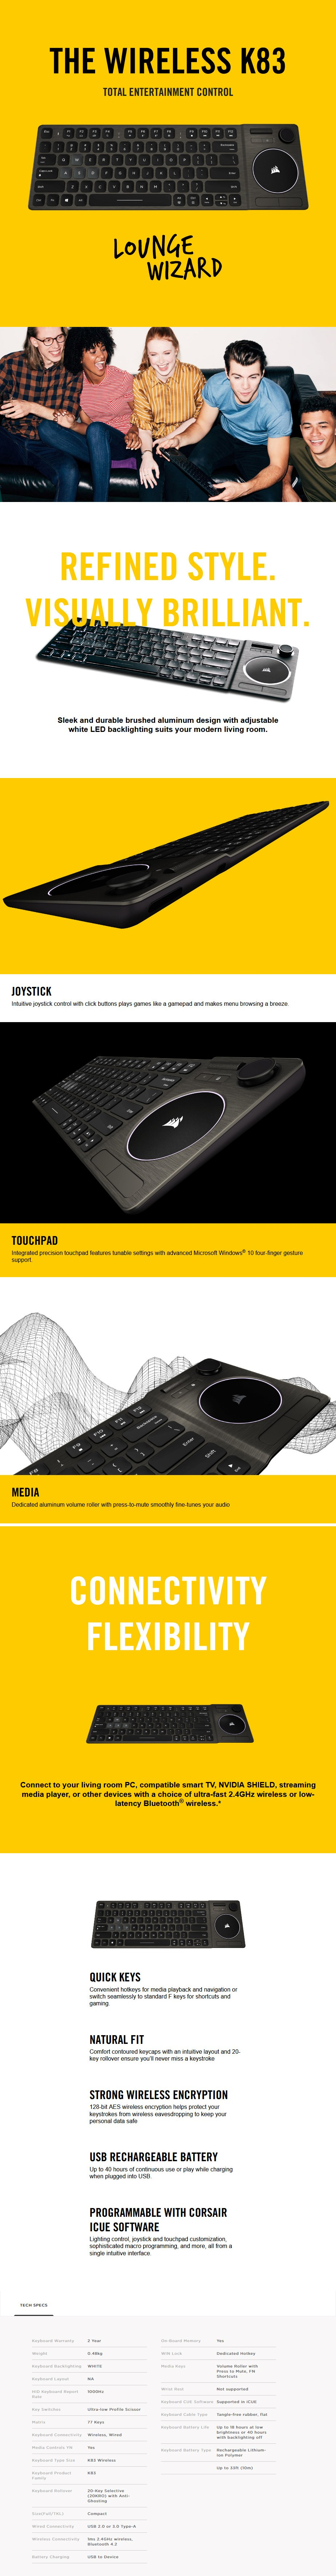 Corsair K83 Compact Wireless Entertainment Keyboard - Overview 1